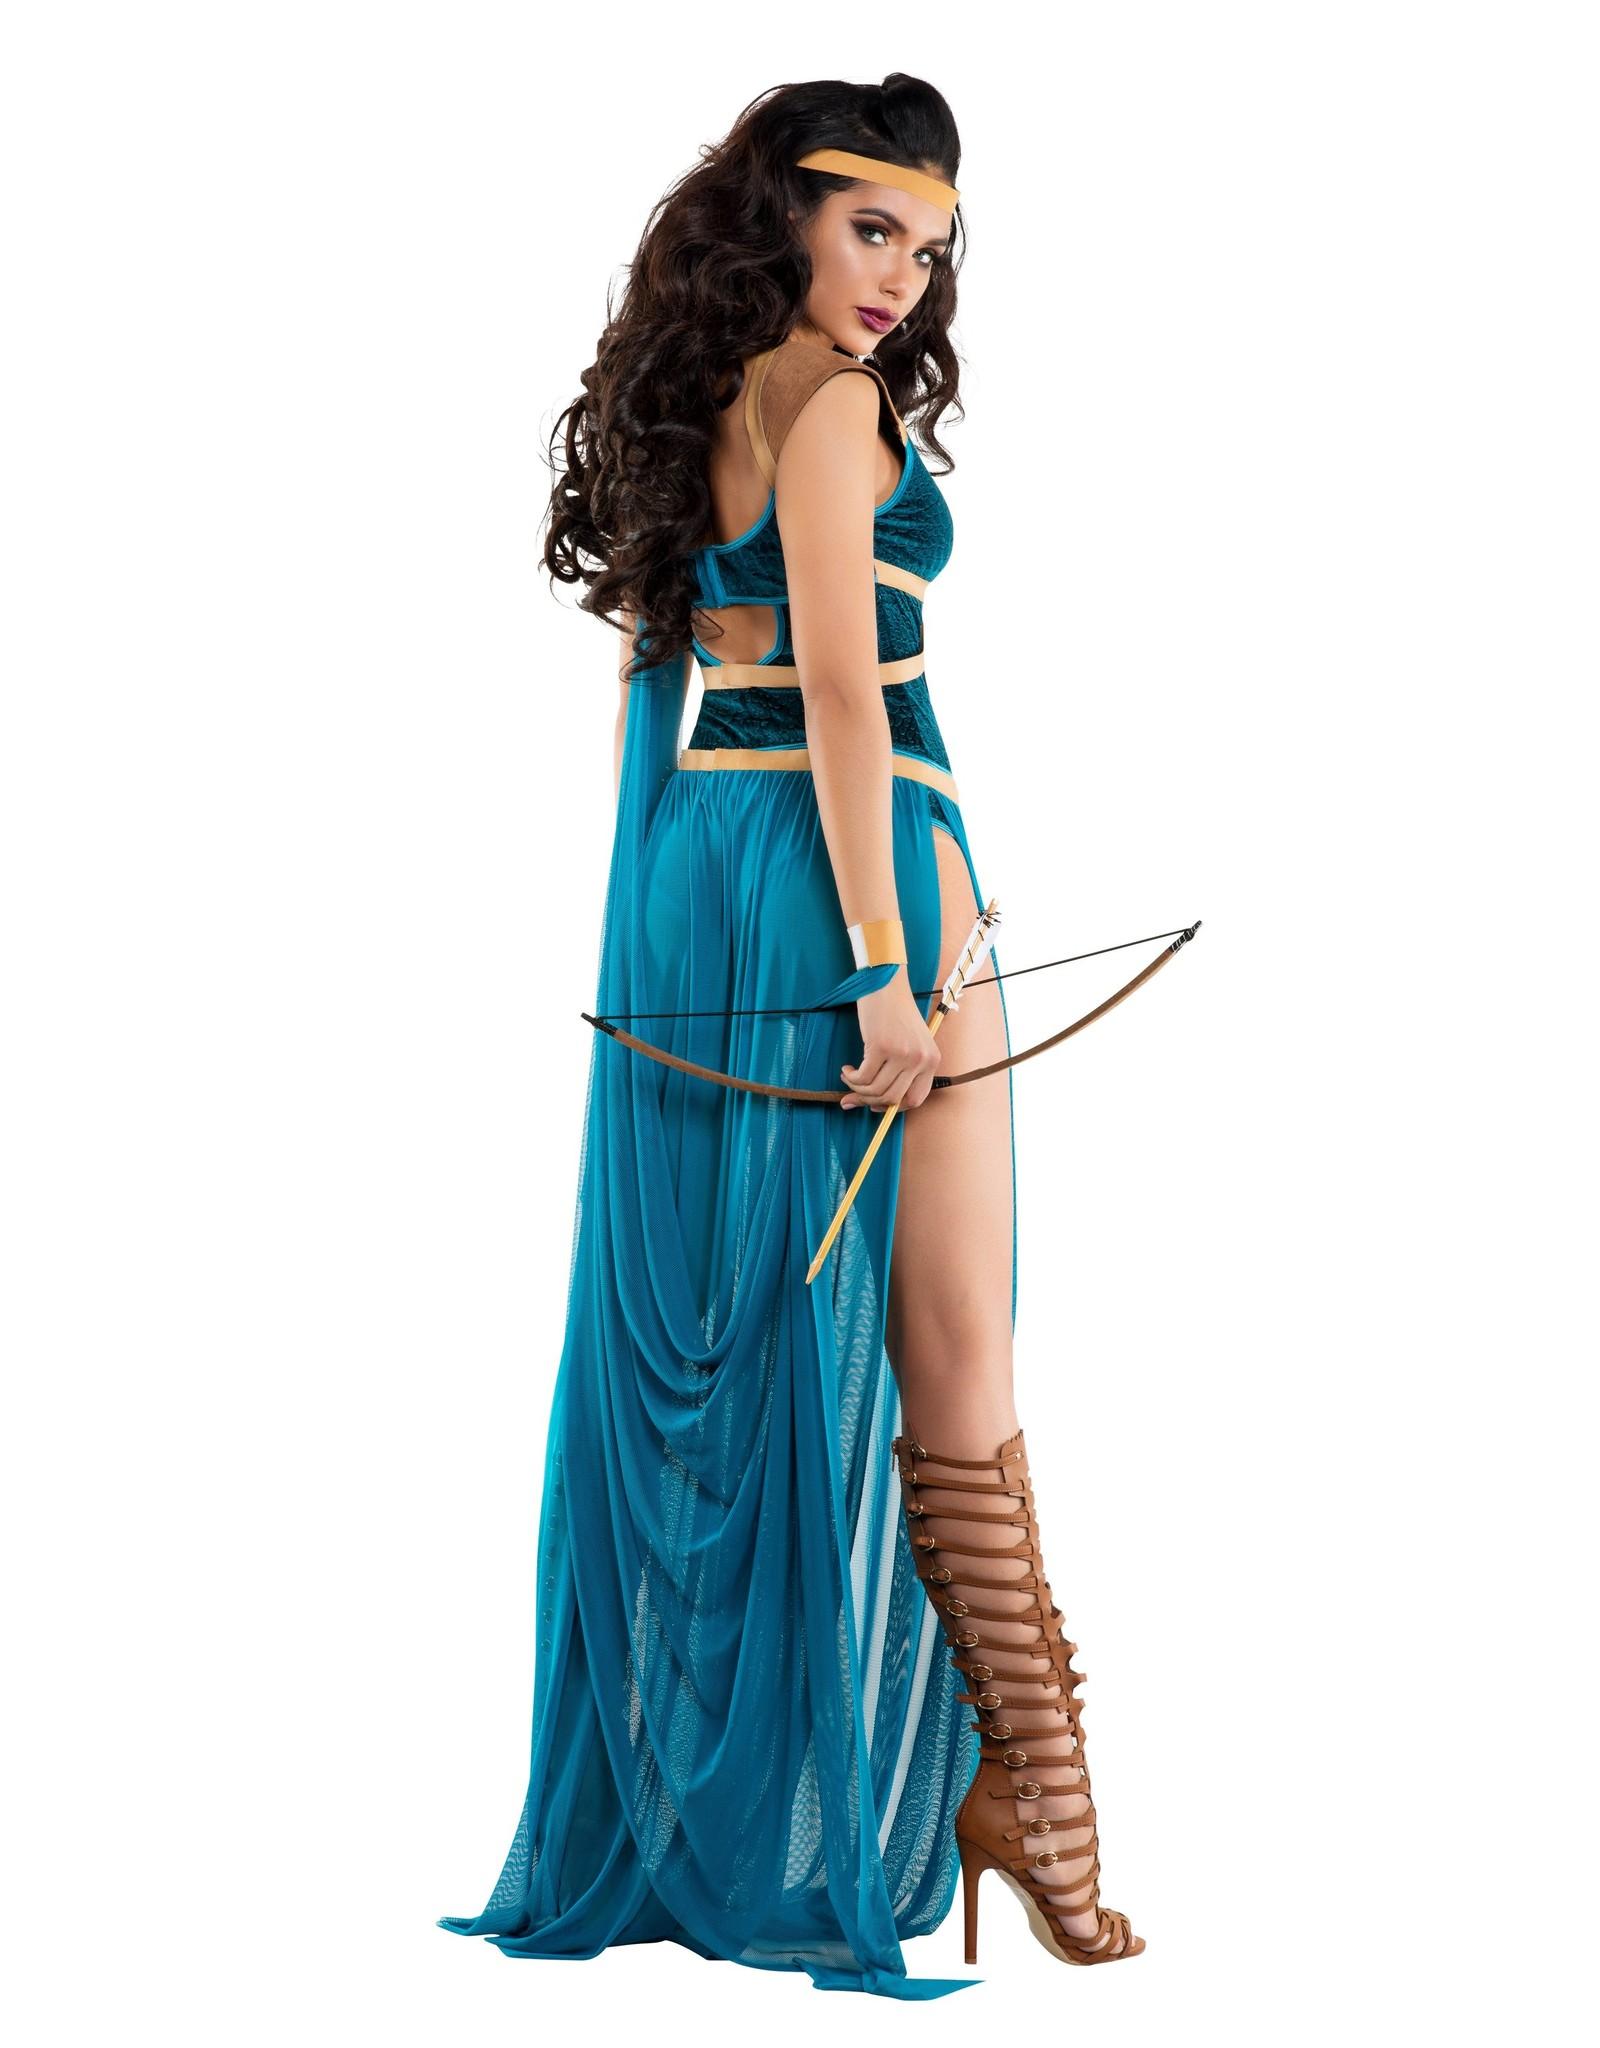 Starline Maiden of the Throne